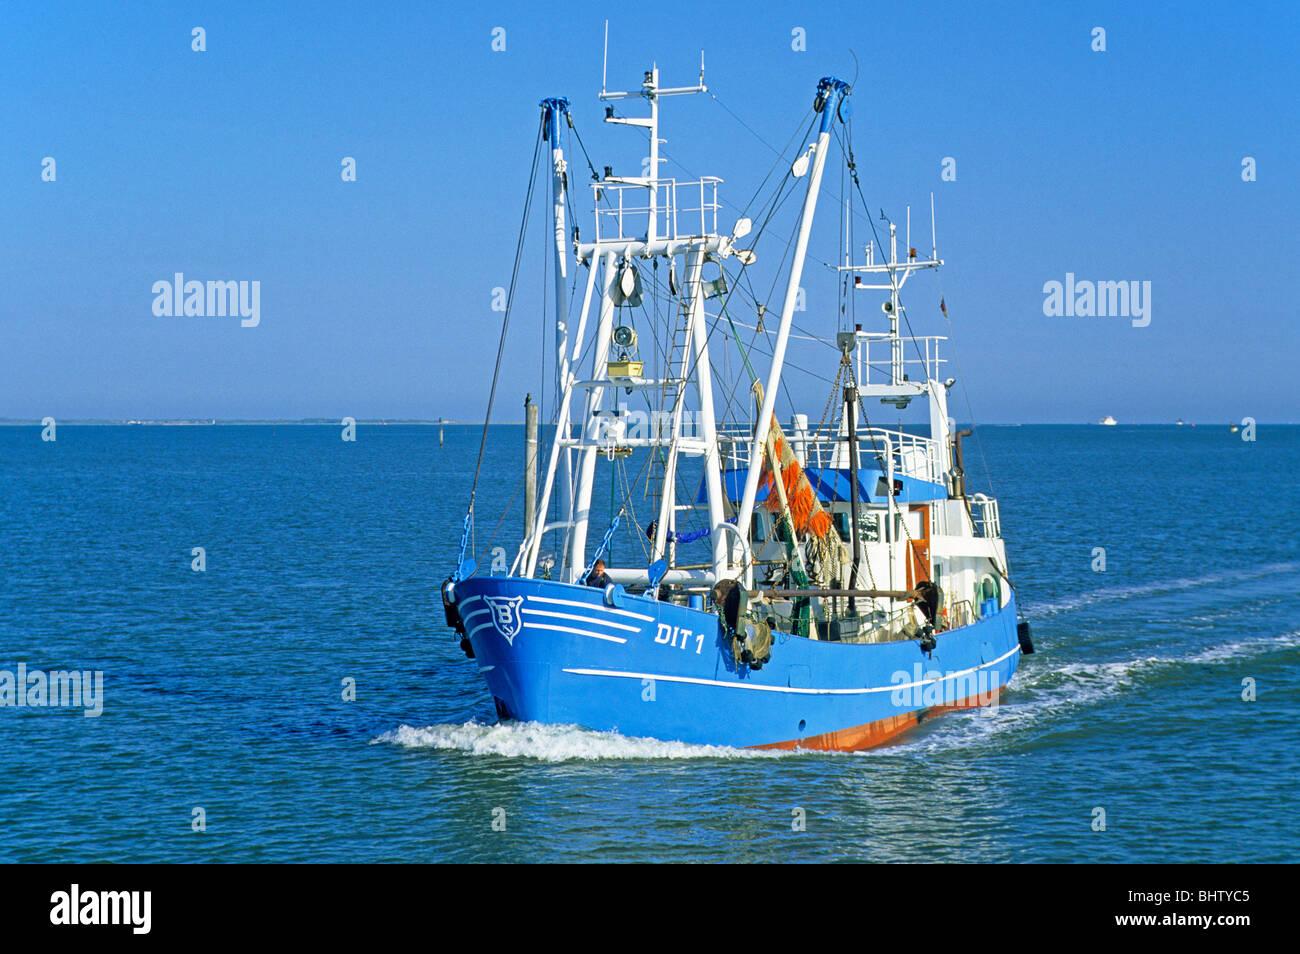 fishing smack near Norddeich, East Friesland, North Sea Coast, Lower Saxony, Germany - Stock Image